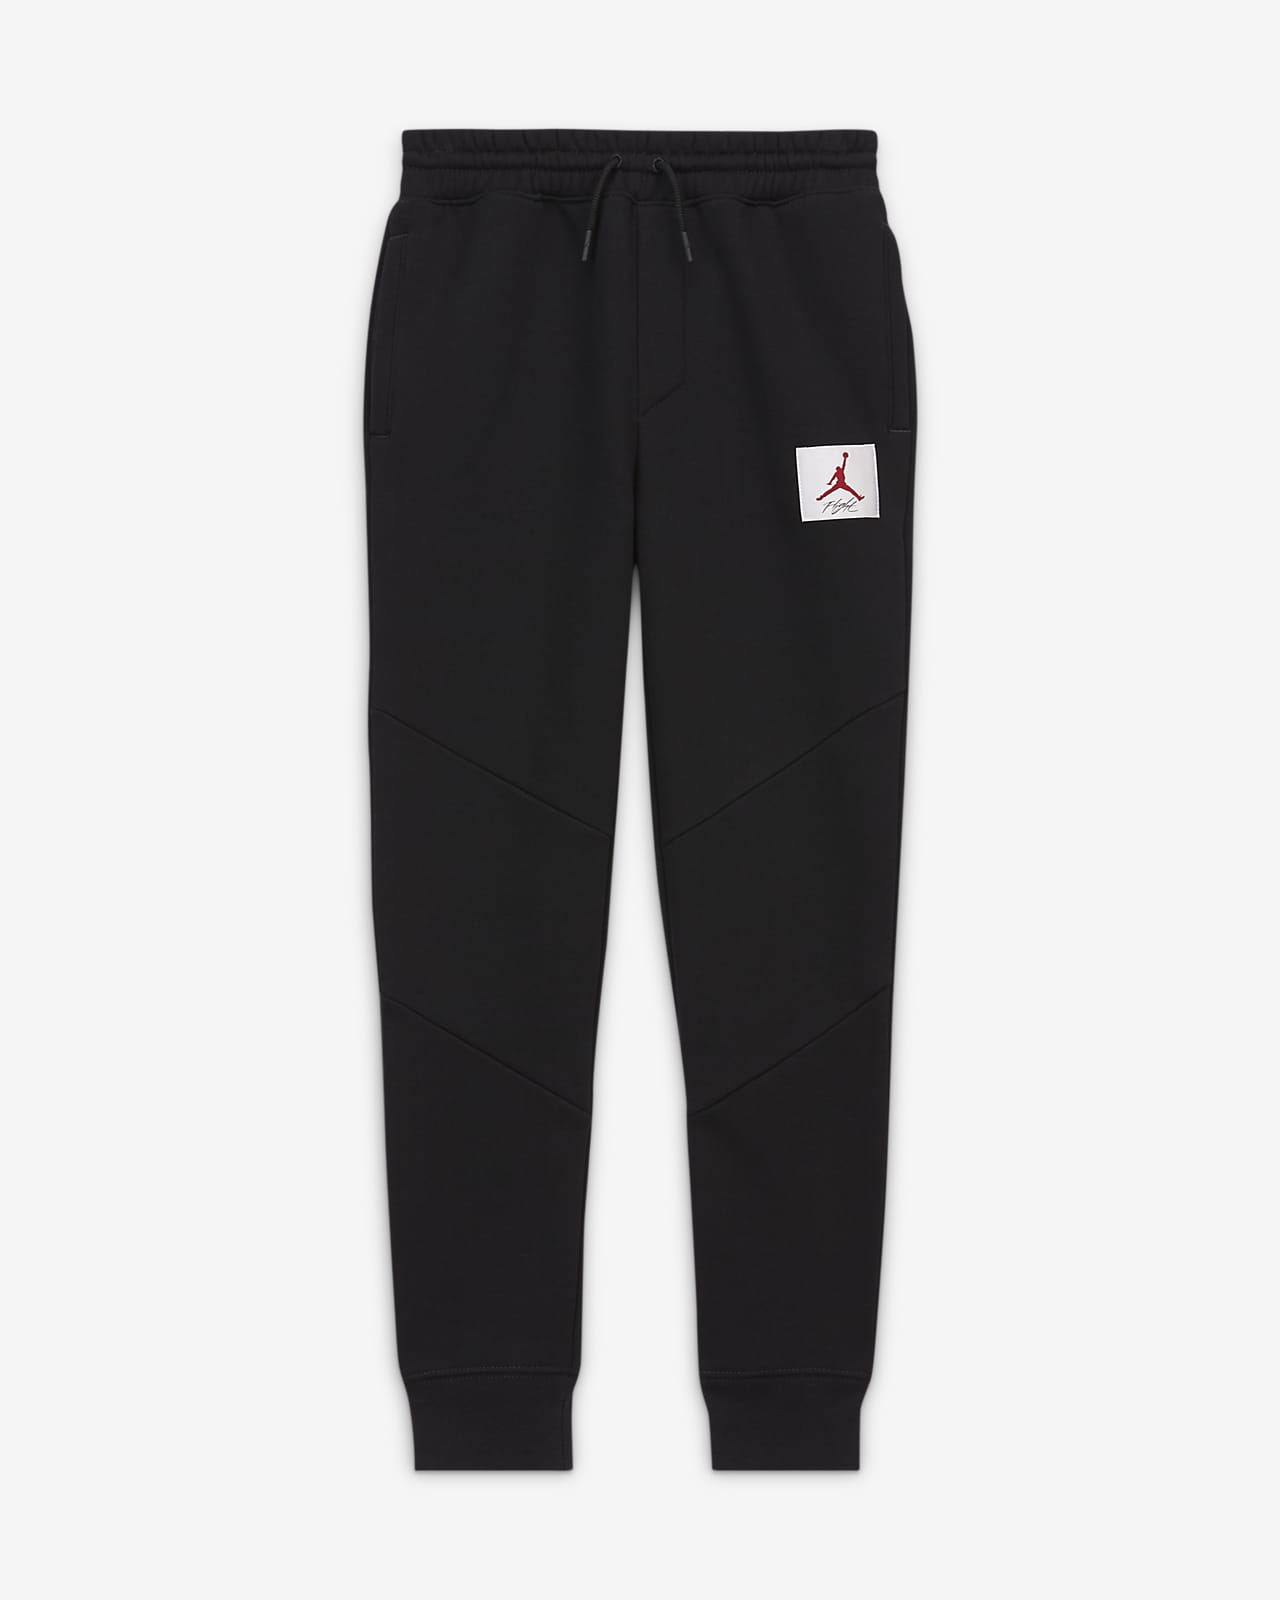 Jordan Big Kids' (Boys') Pants. Nike.com